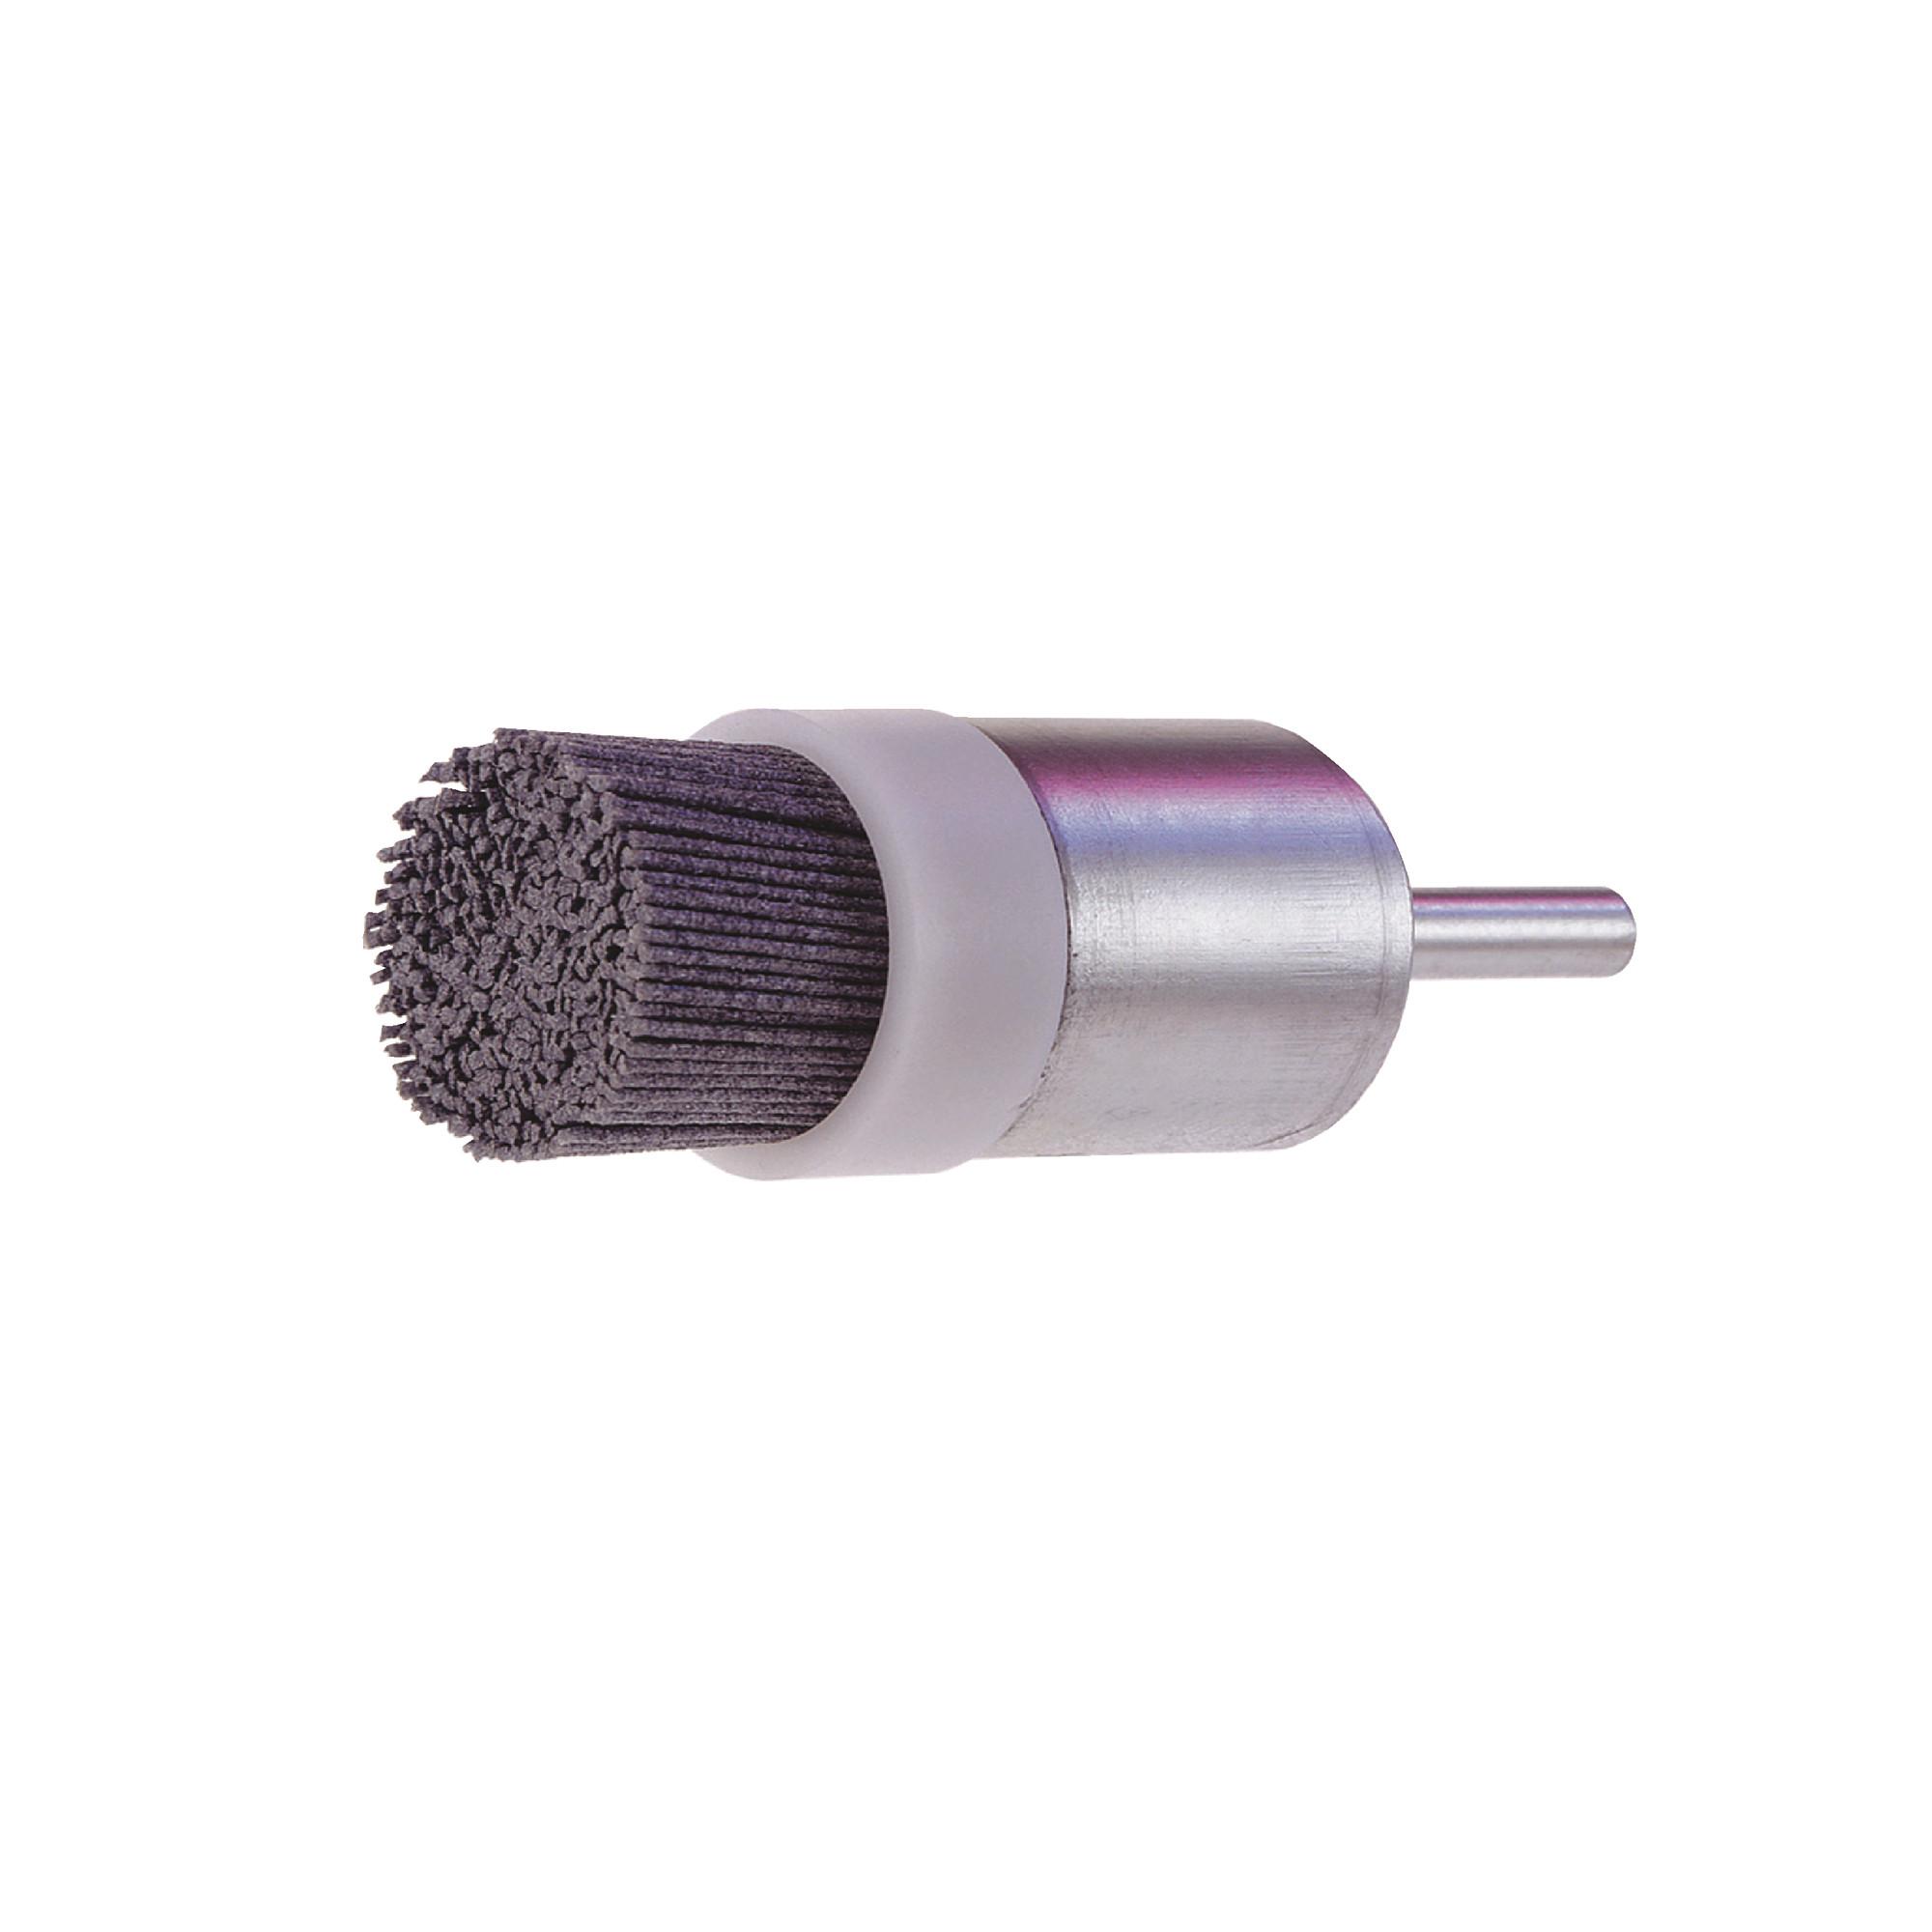 ATB Flexible Nylon Abrasive Brush